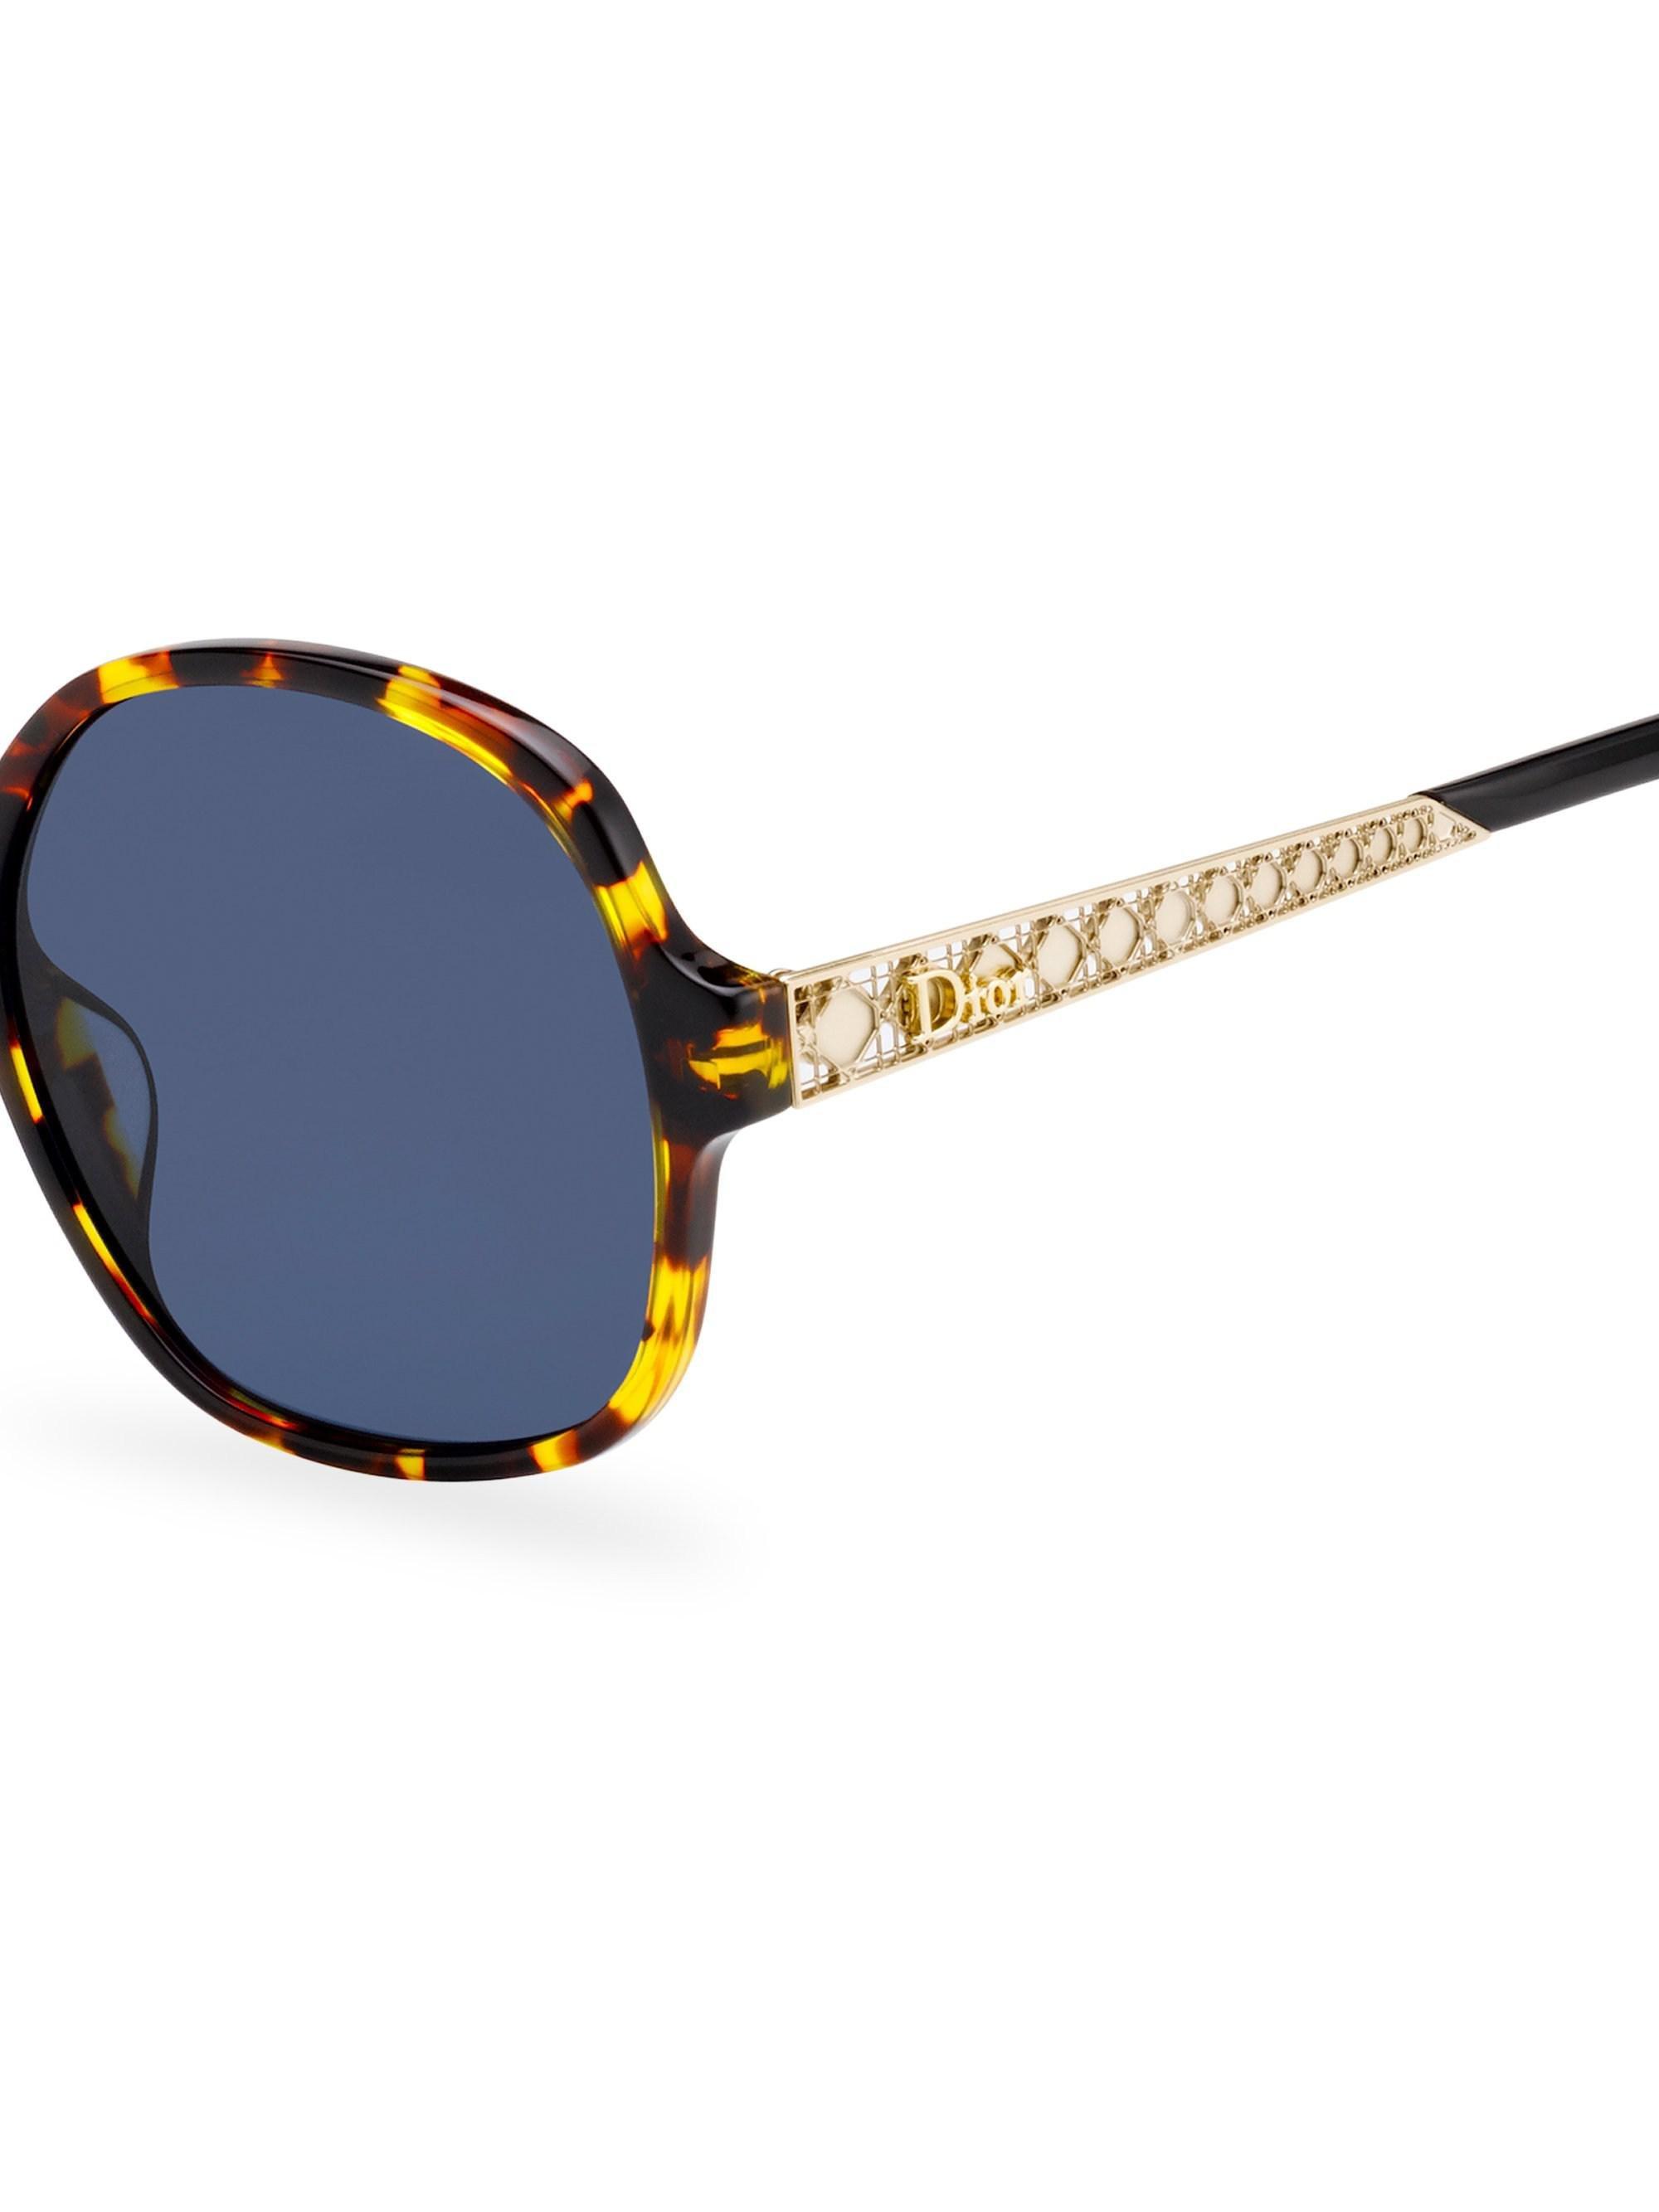 48ab46709fc Dior - Blue Ama 58mm Oversized Round Sunglasses - Lyst. View fullscreen